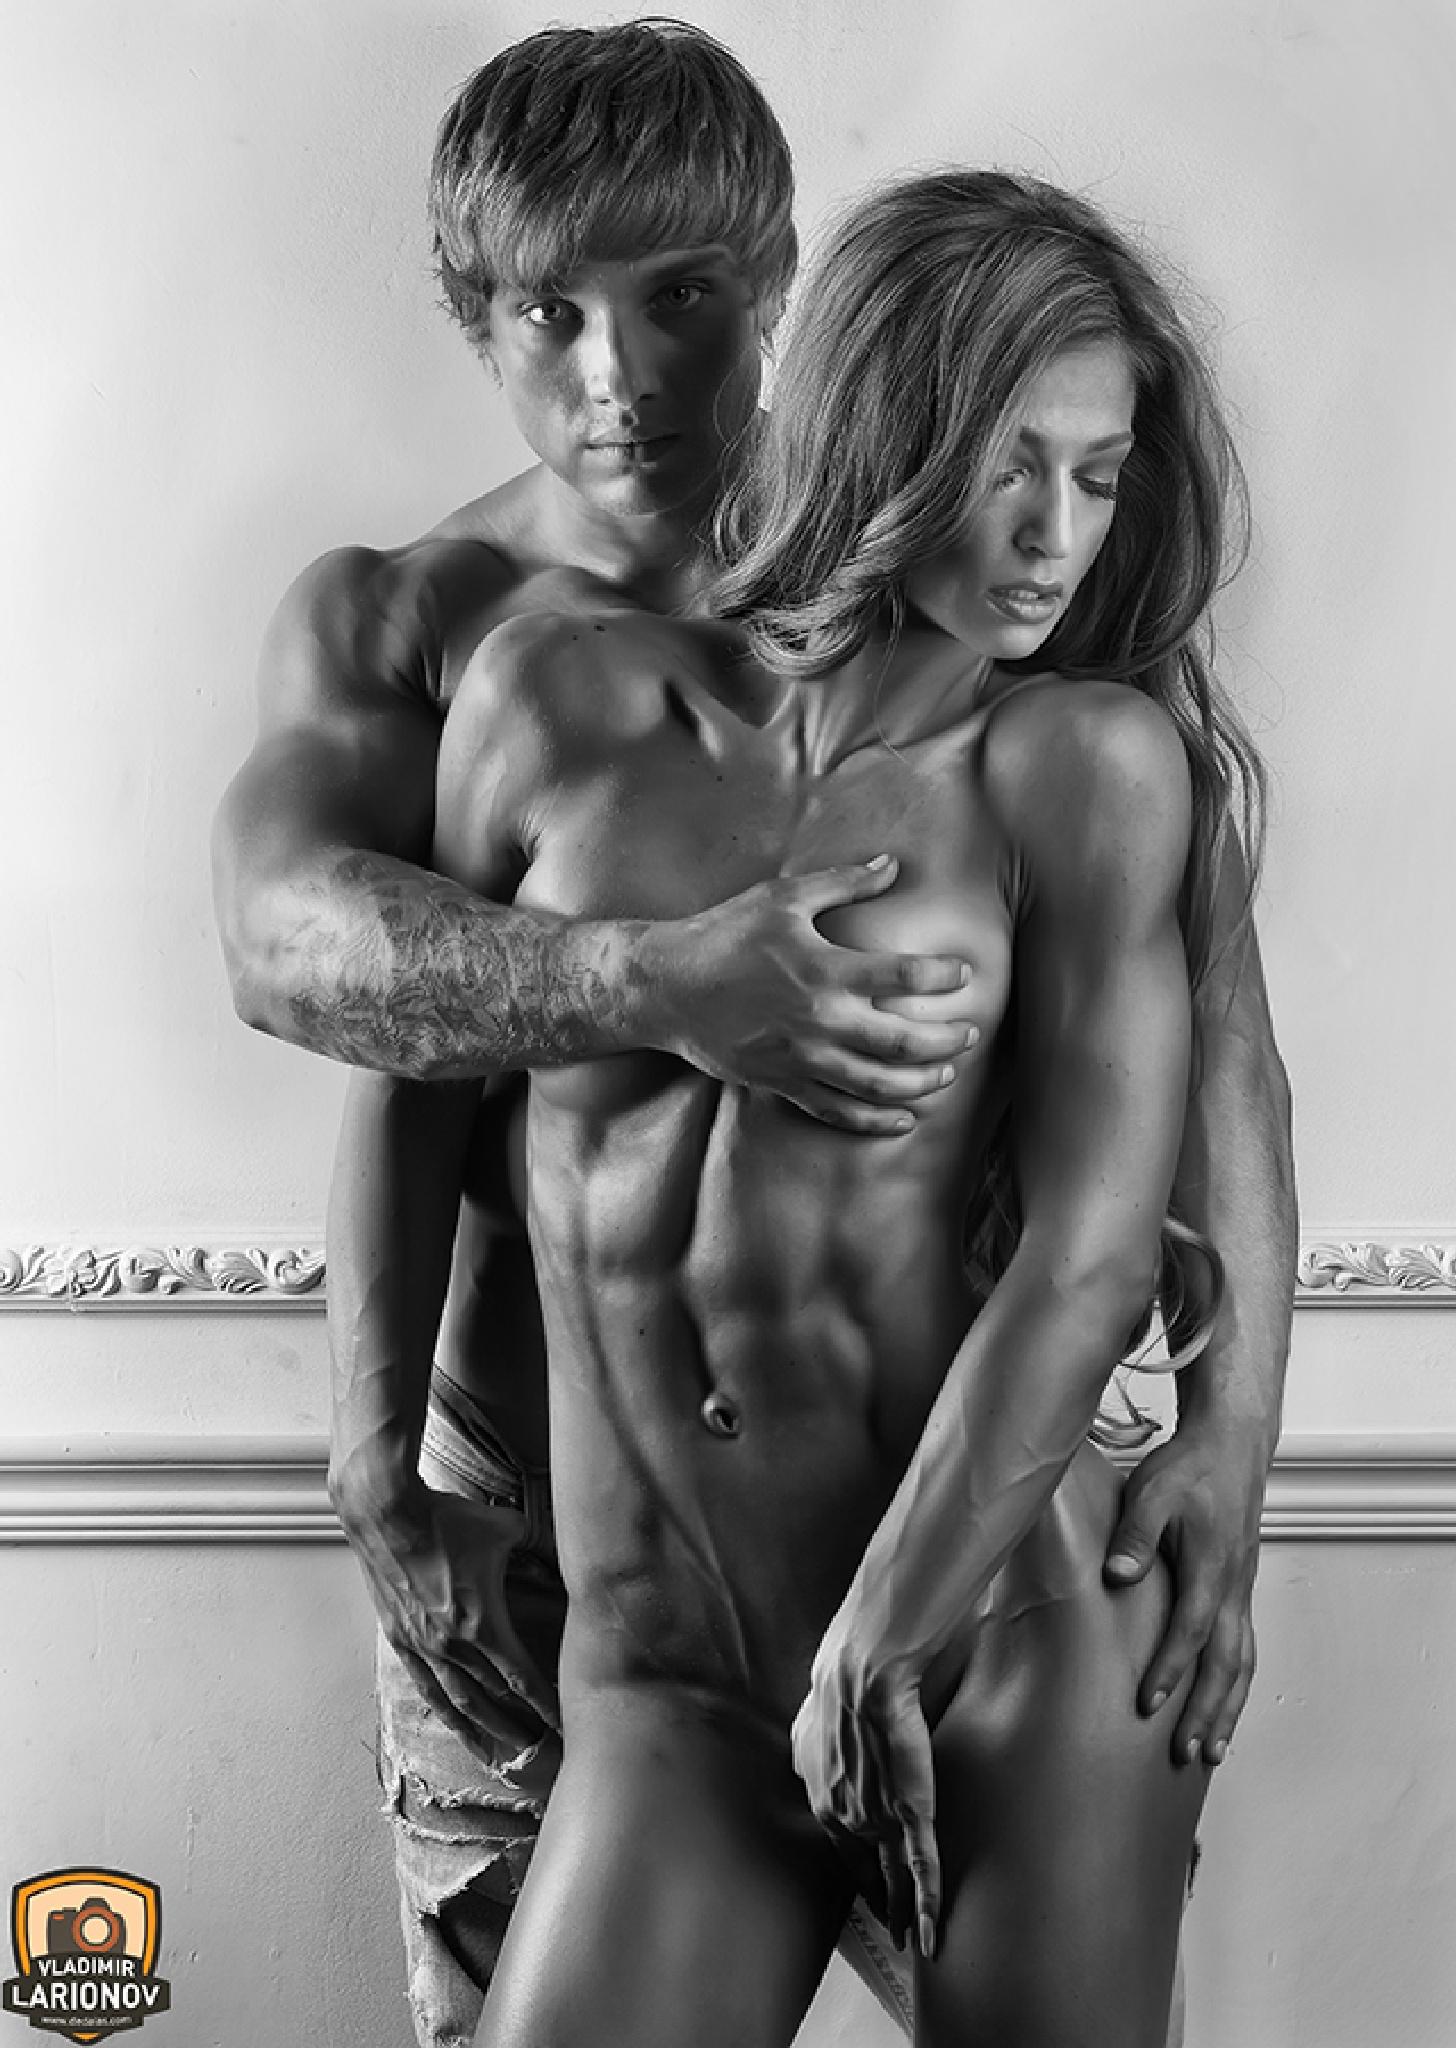 Athletes by Vladimir Larionov